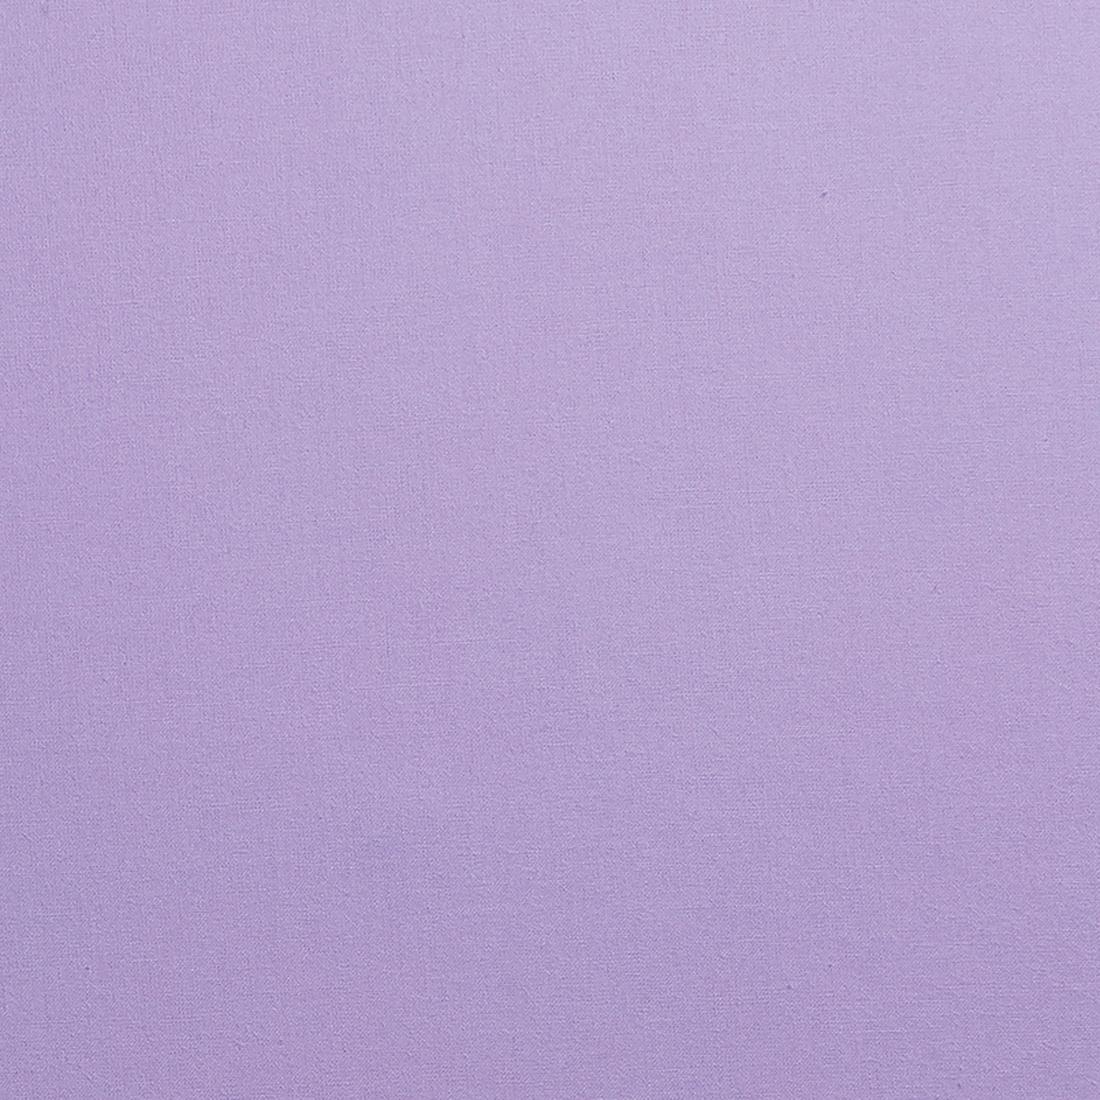 Craft Cotton Lavender Fabric